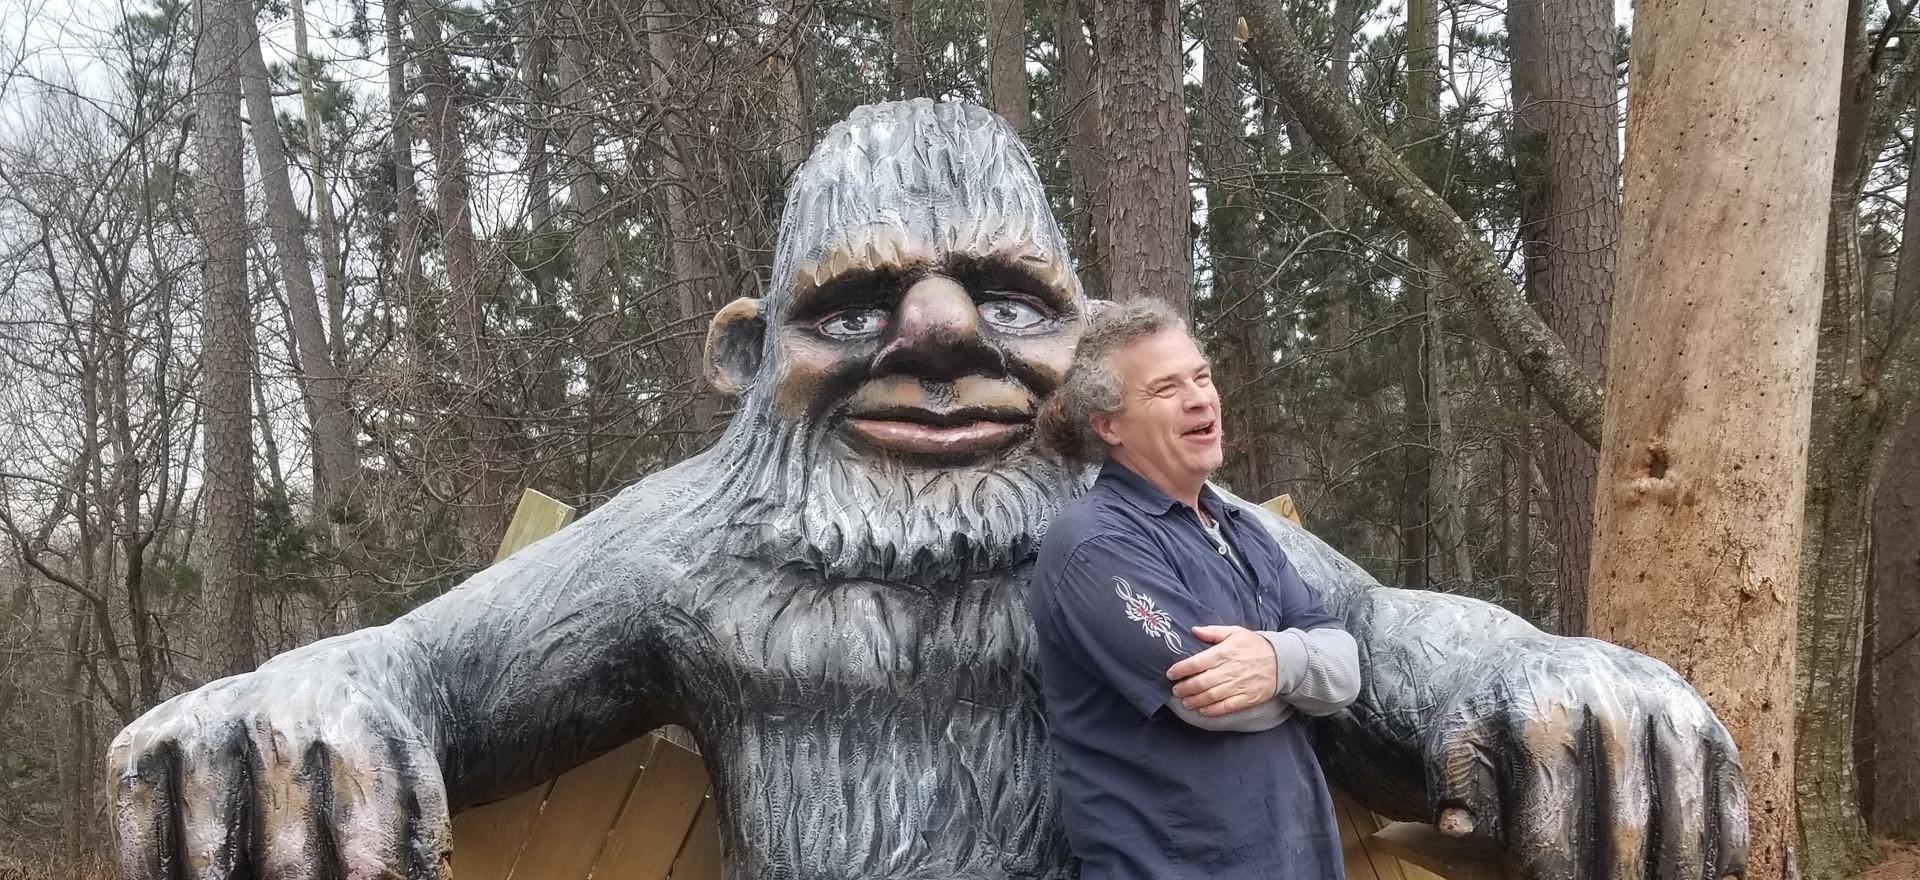 Bigfoot/Sasquatch broke the bench!